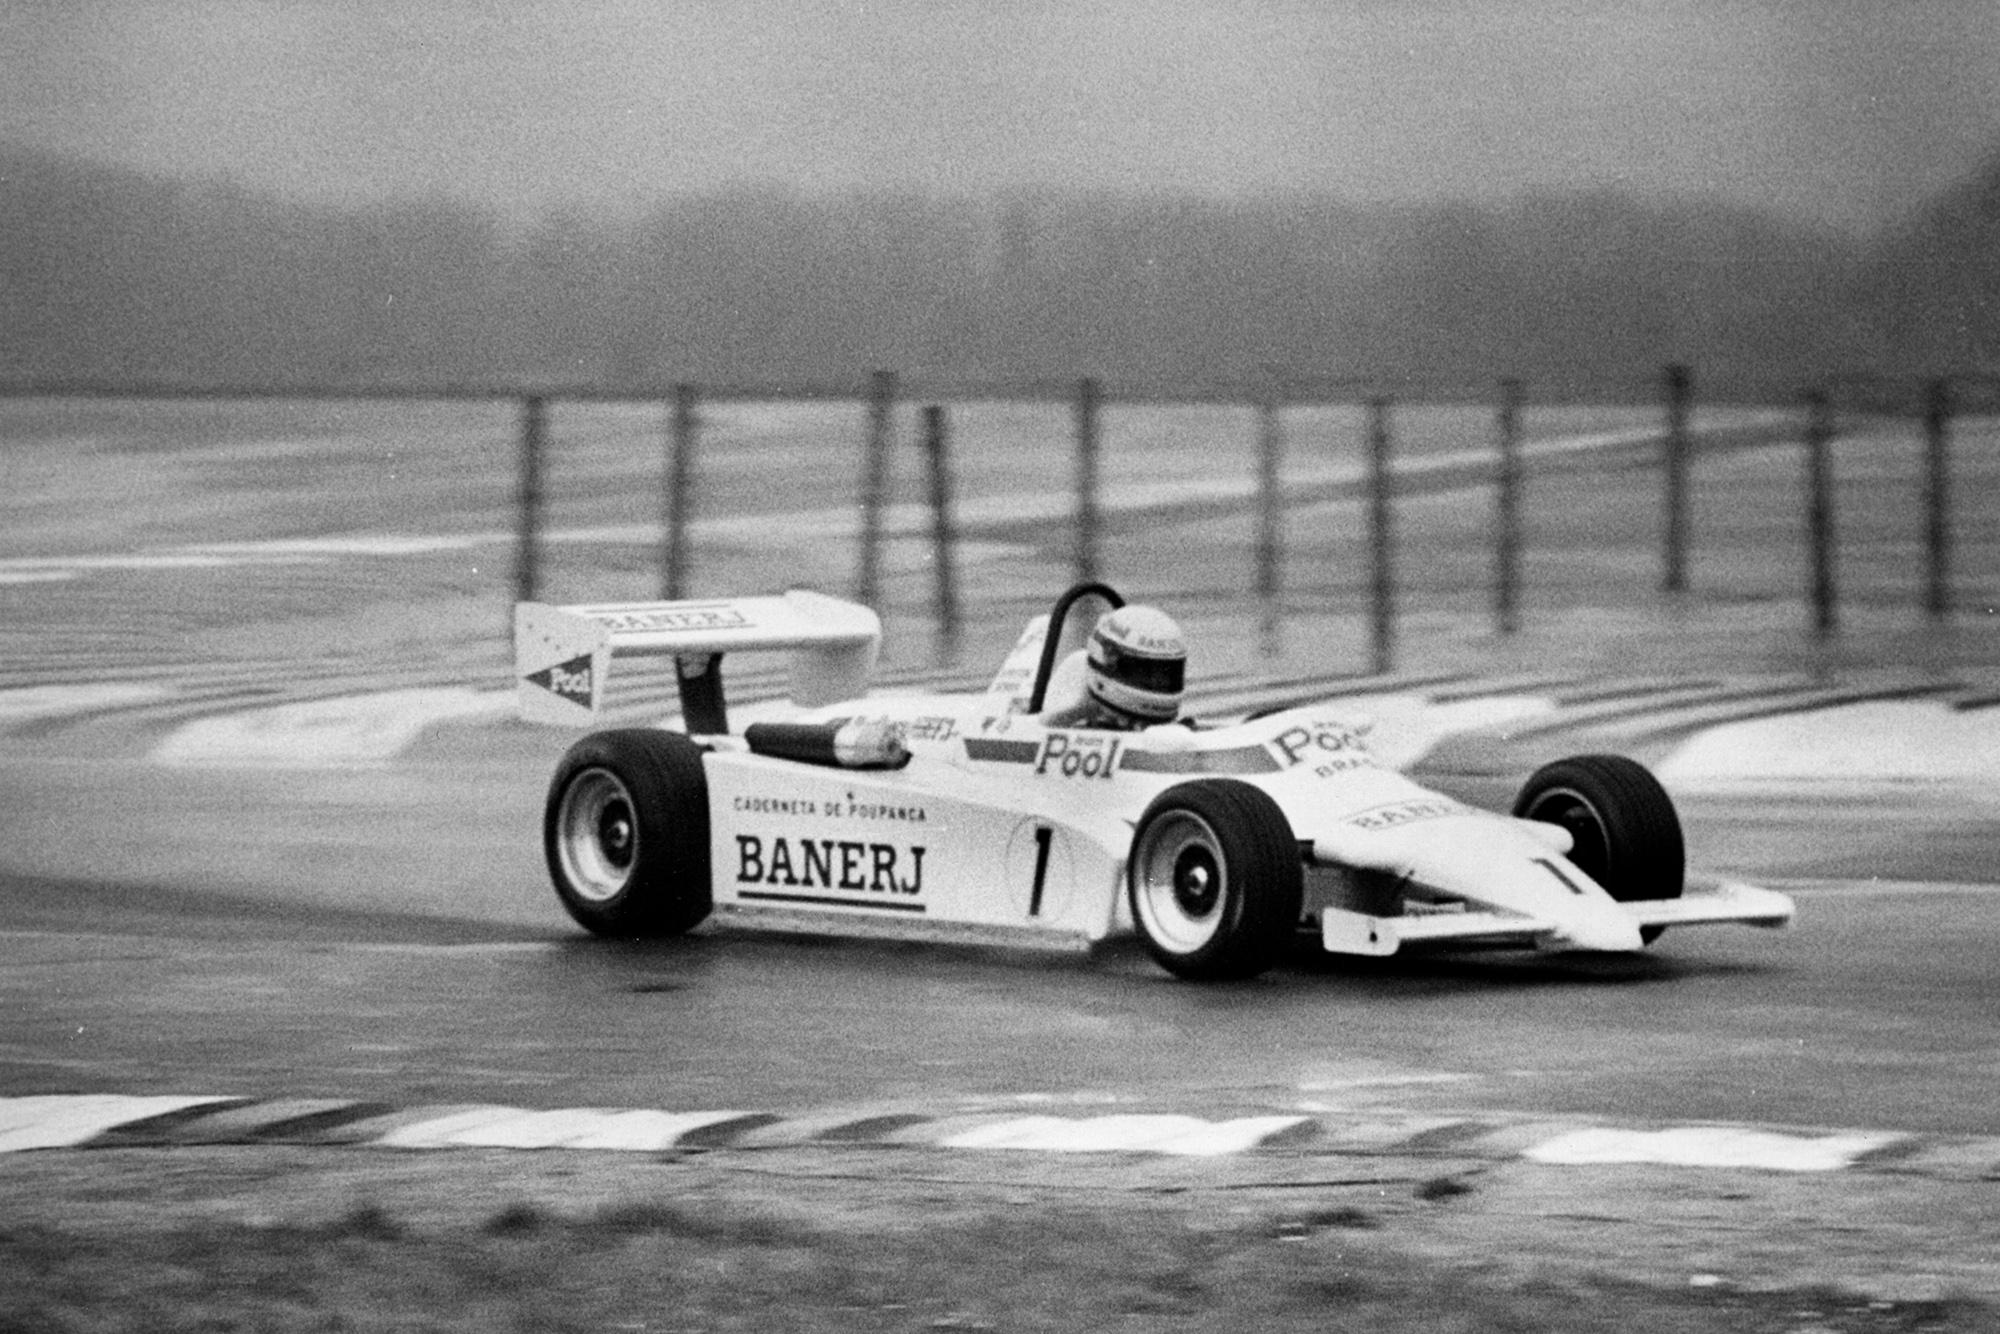 2. Ayrton Senna racing his Ralt RT3 at Thruxton in the 1983 Formula 3 Championship